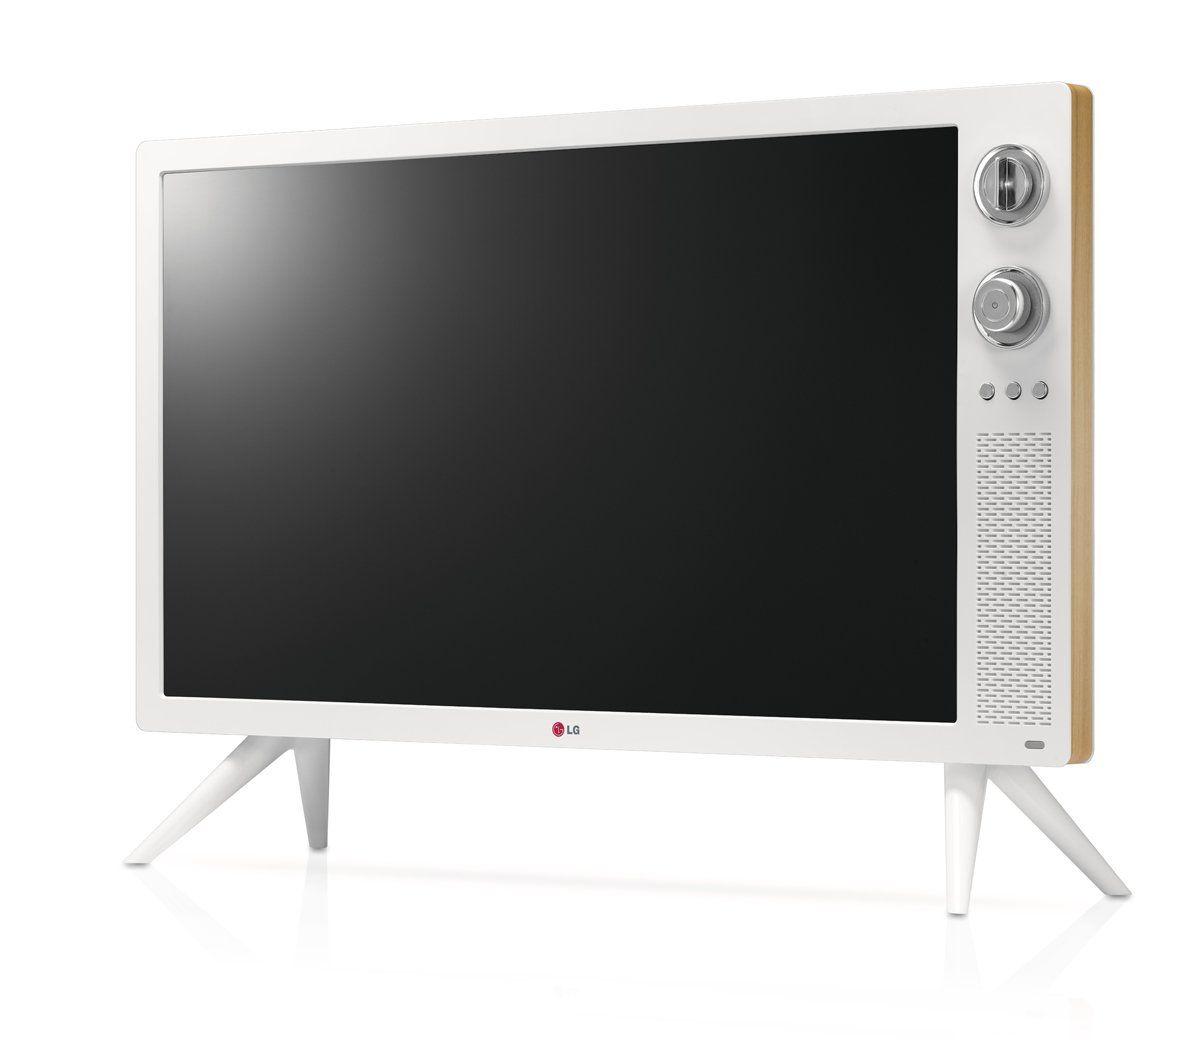 Lg 32ln630r Classic Tv Television 32 Full Hd Led Retro Design Ips Display Amazon Com Electronics Classic Tv Retro Design Design